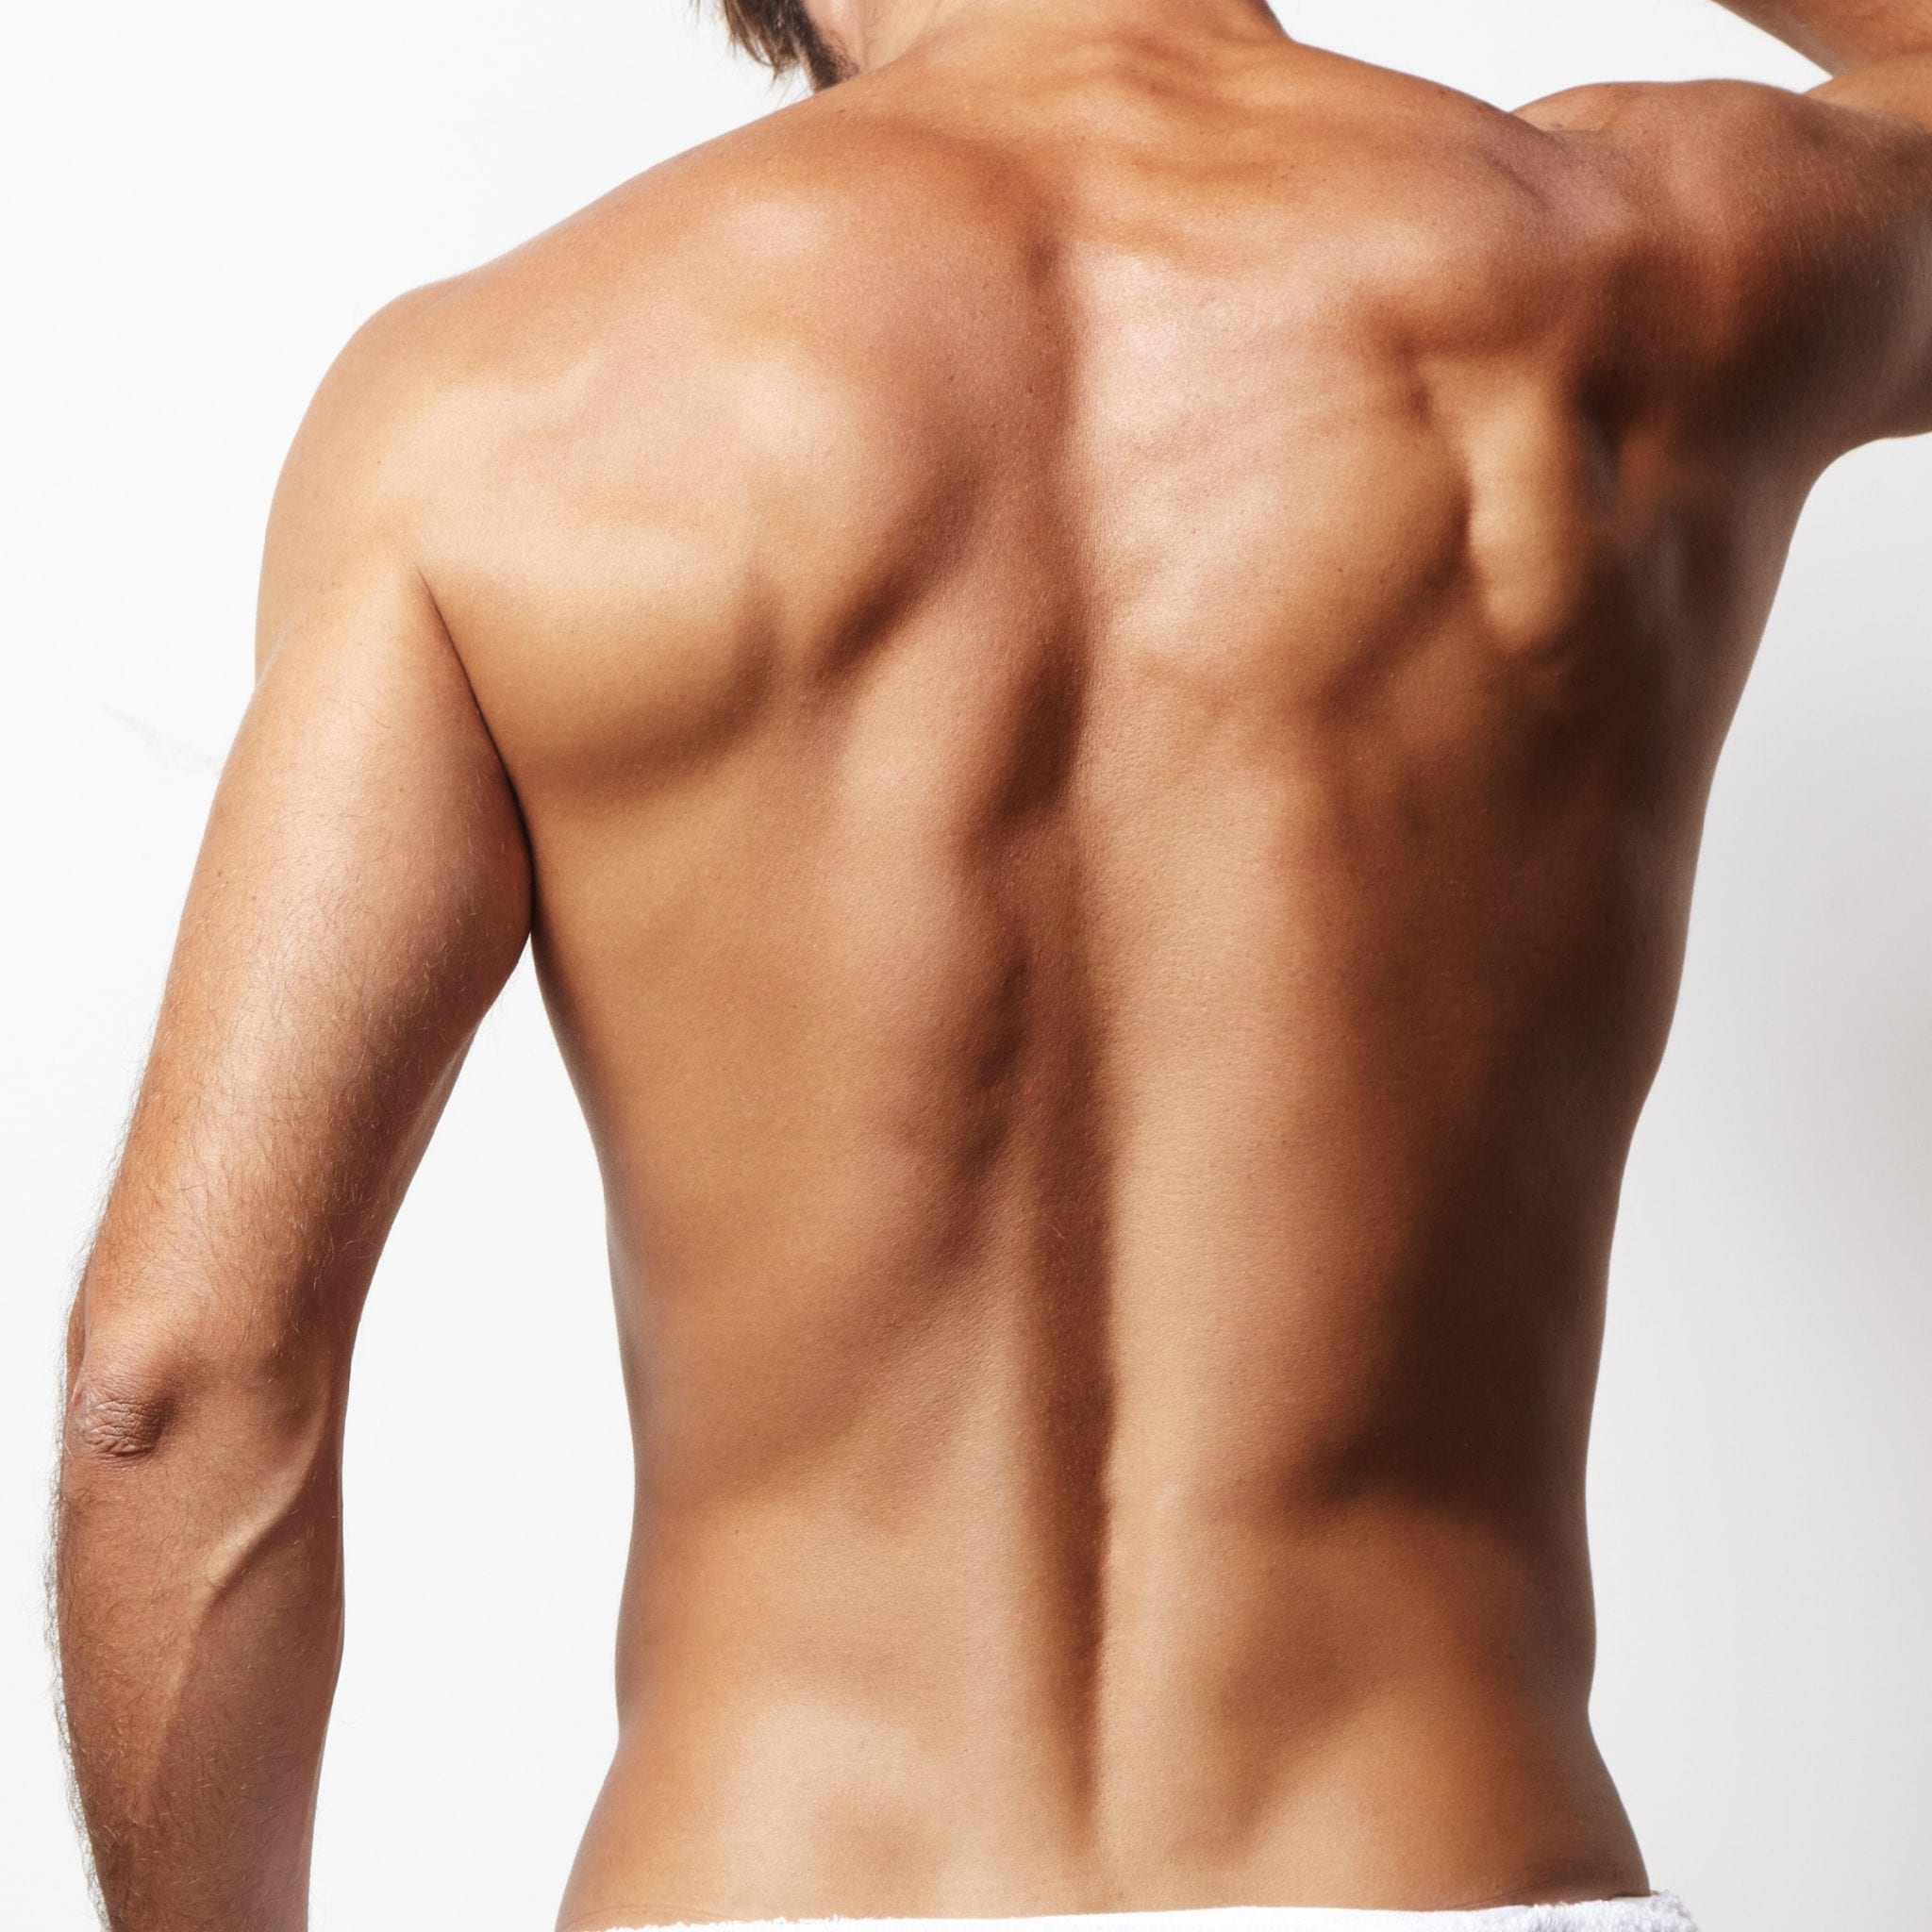 фото спины мужика захотите